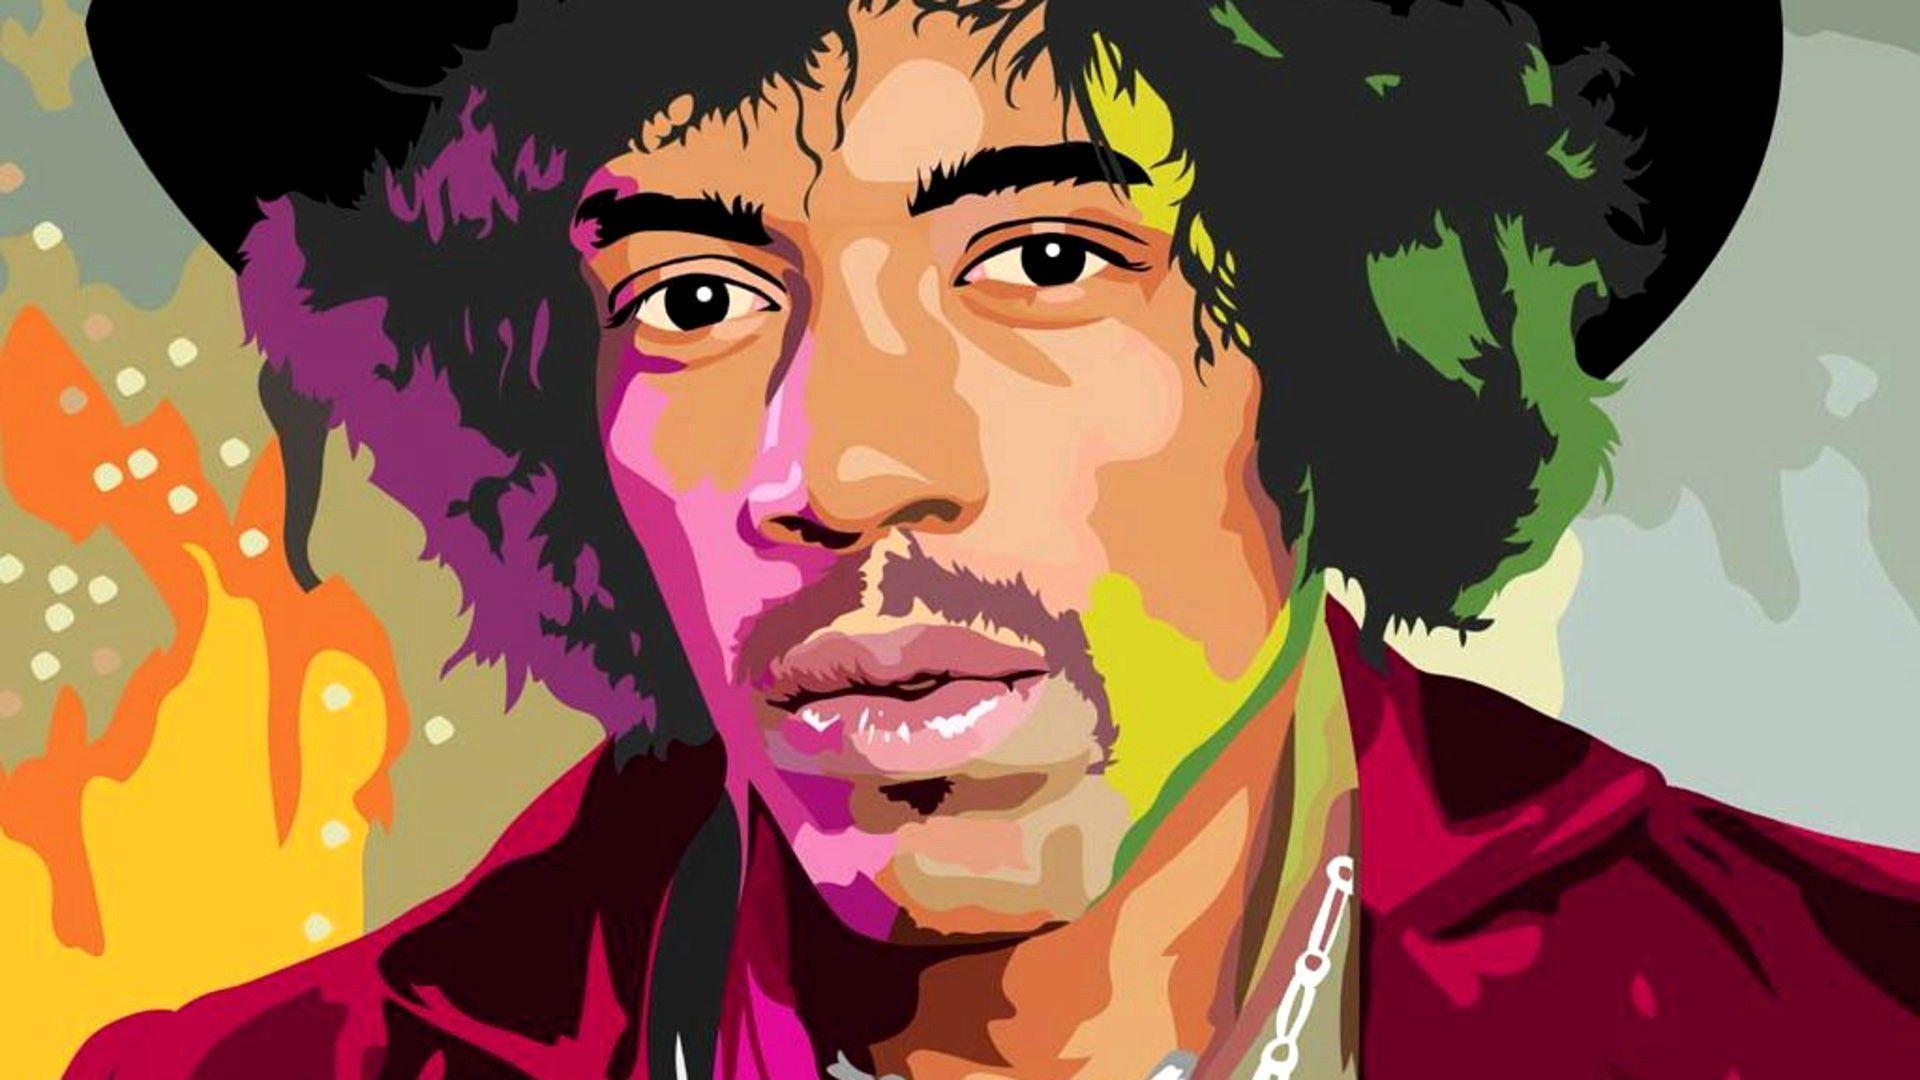 Jimi Hendrix Backgrounds - Wallpaper Cave